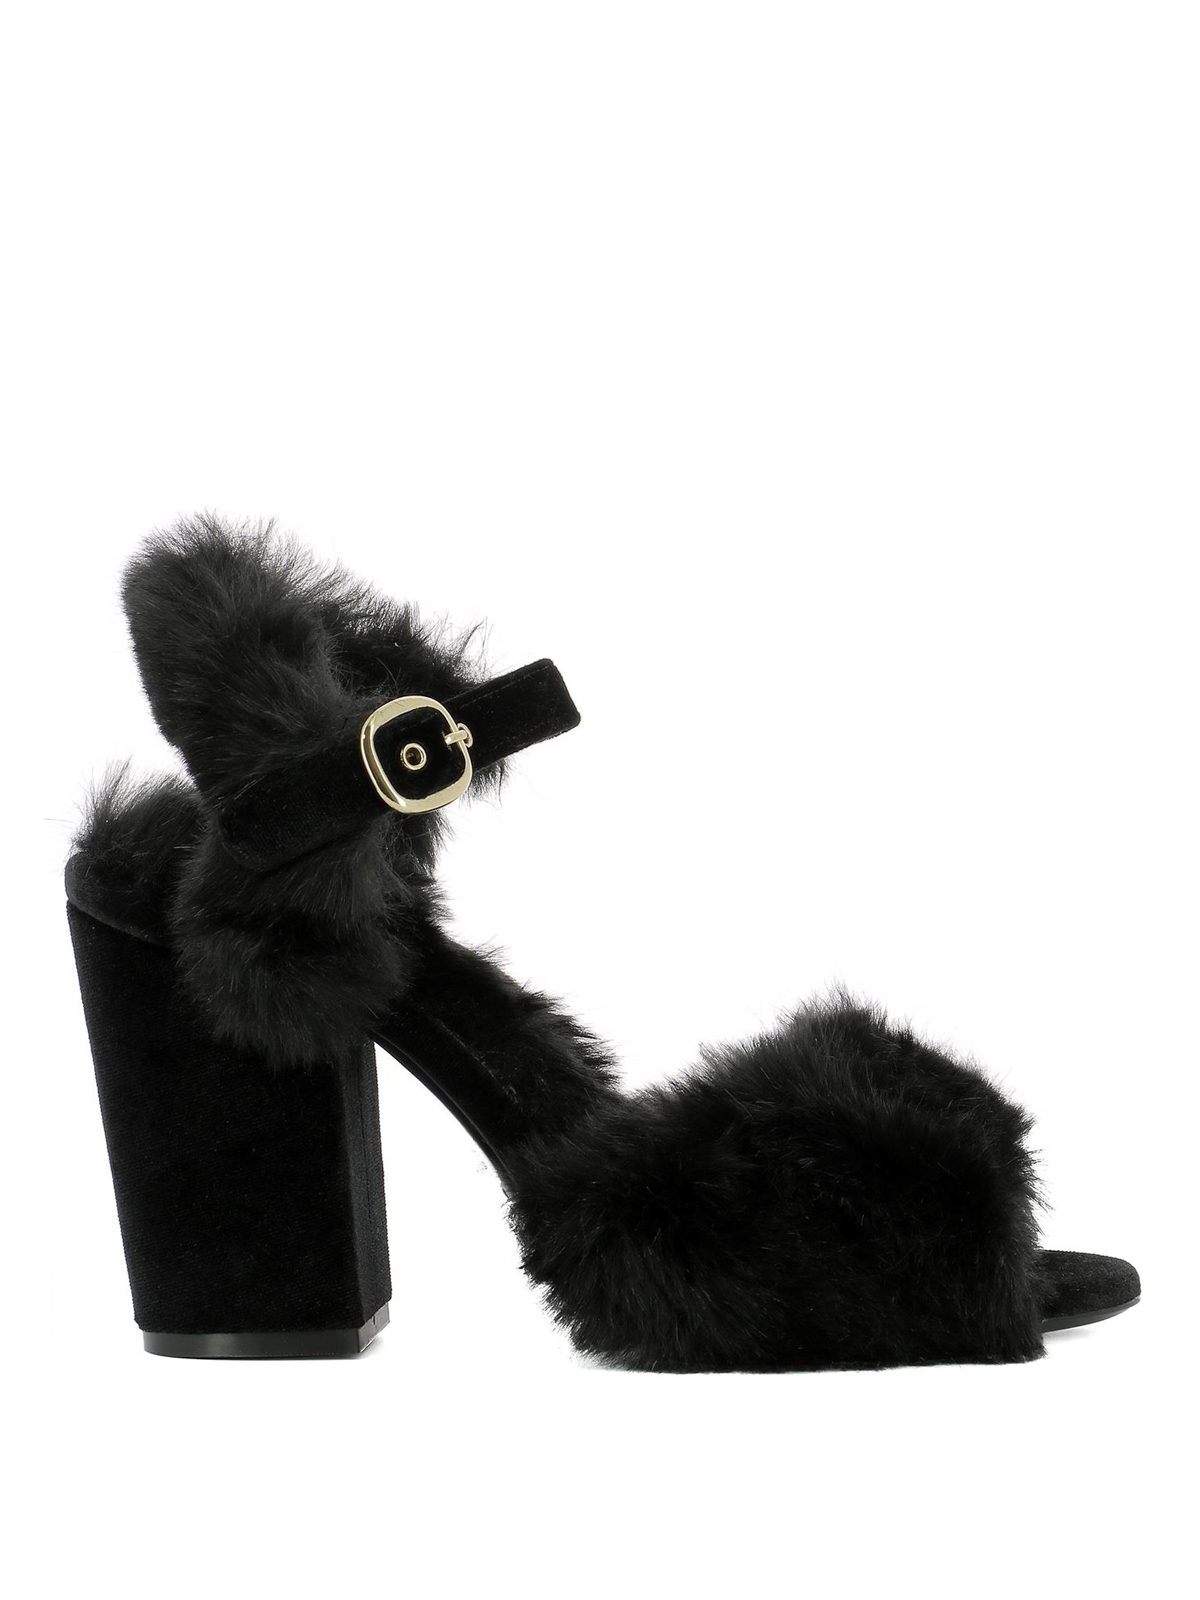 da9efe43cb1 Strategia - Black fur heeled sandals - sandals - A3318PELLENERO